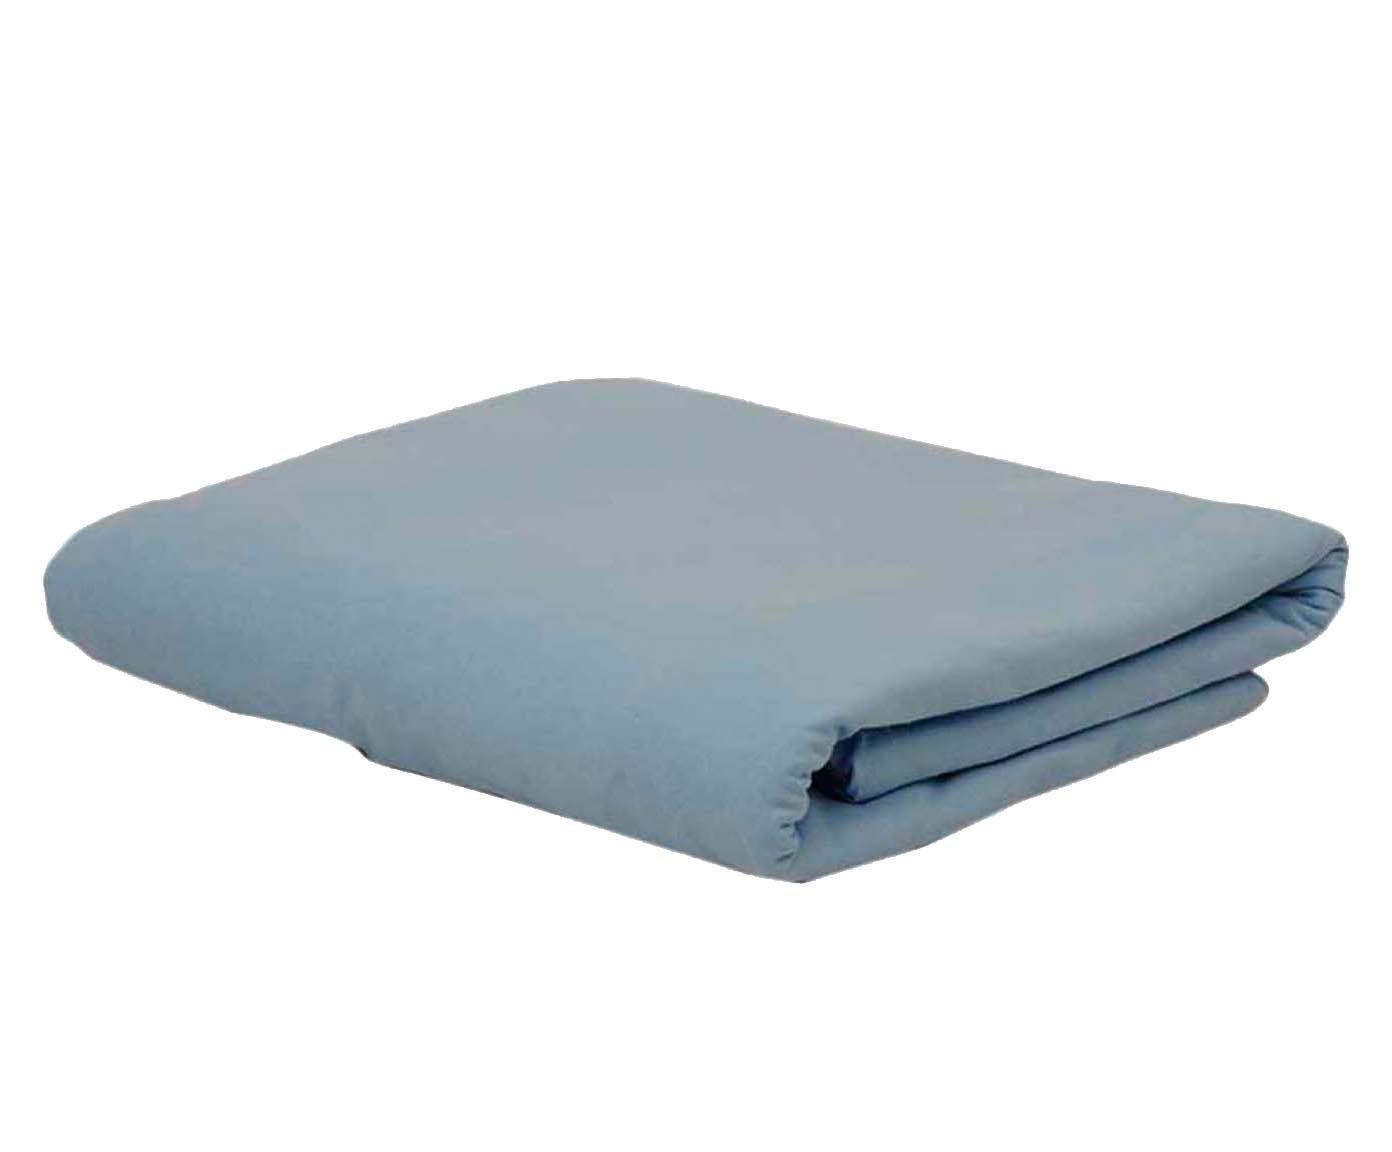 Lençol cosmos zen - para cama de casal | Westwing.com.br